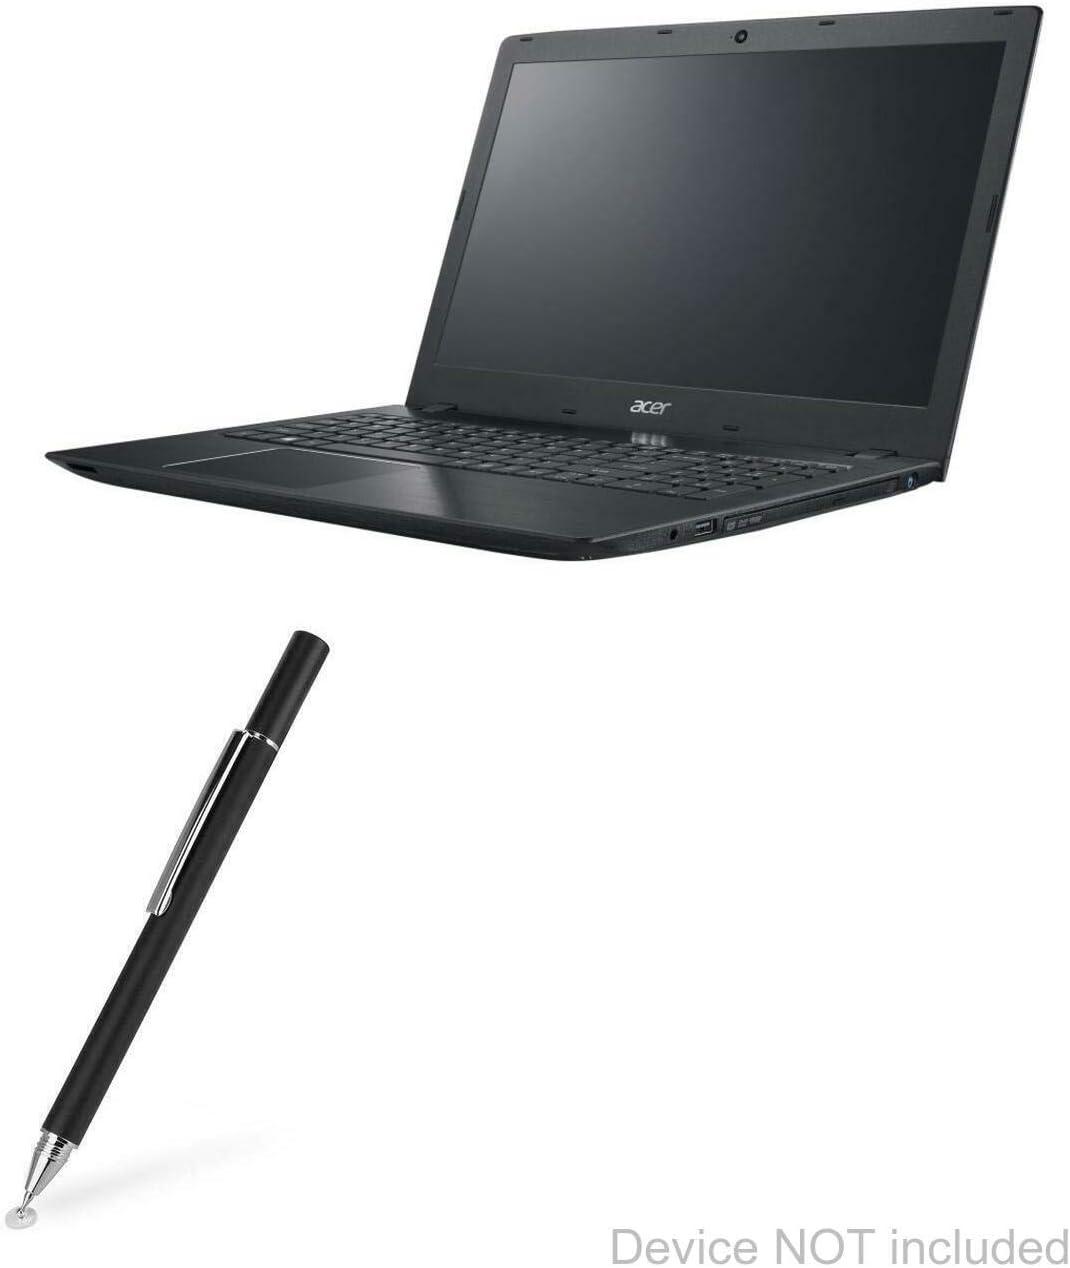 Stylus Pen for Acer Chromebook Spin 311 (R721T) (Stylus Pen by BoxWave) - FineTouch Capacitive Stylus, Super Precise Stylus Pen for Acer Chromebook Spin 311 (R721T) - Jet Black